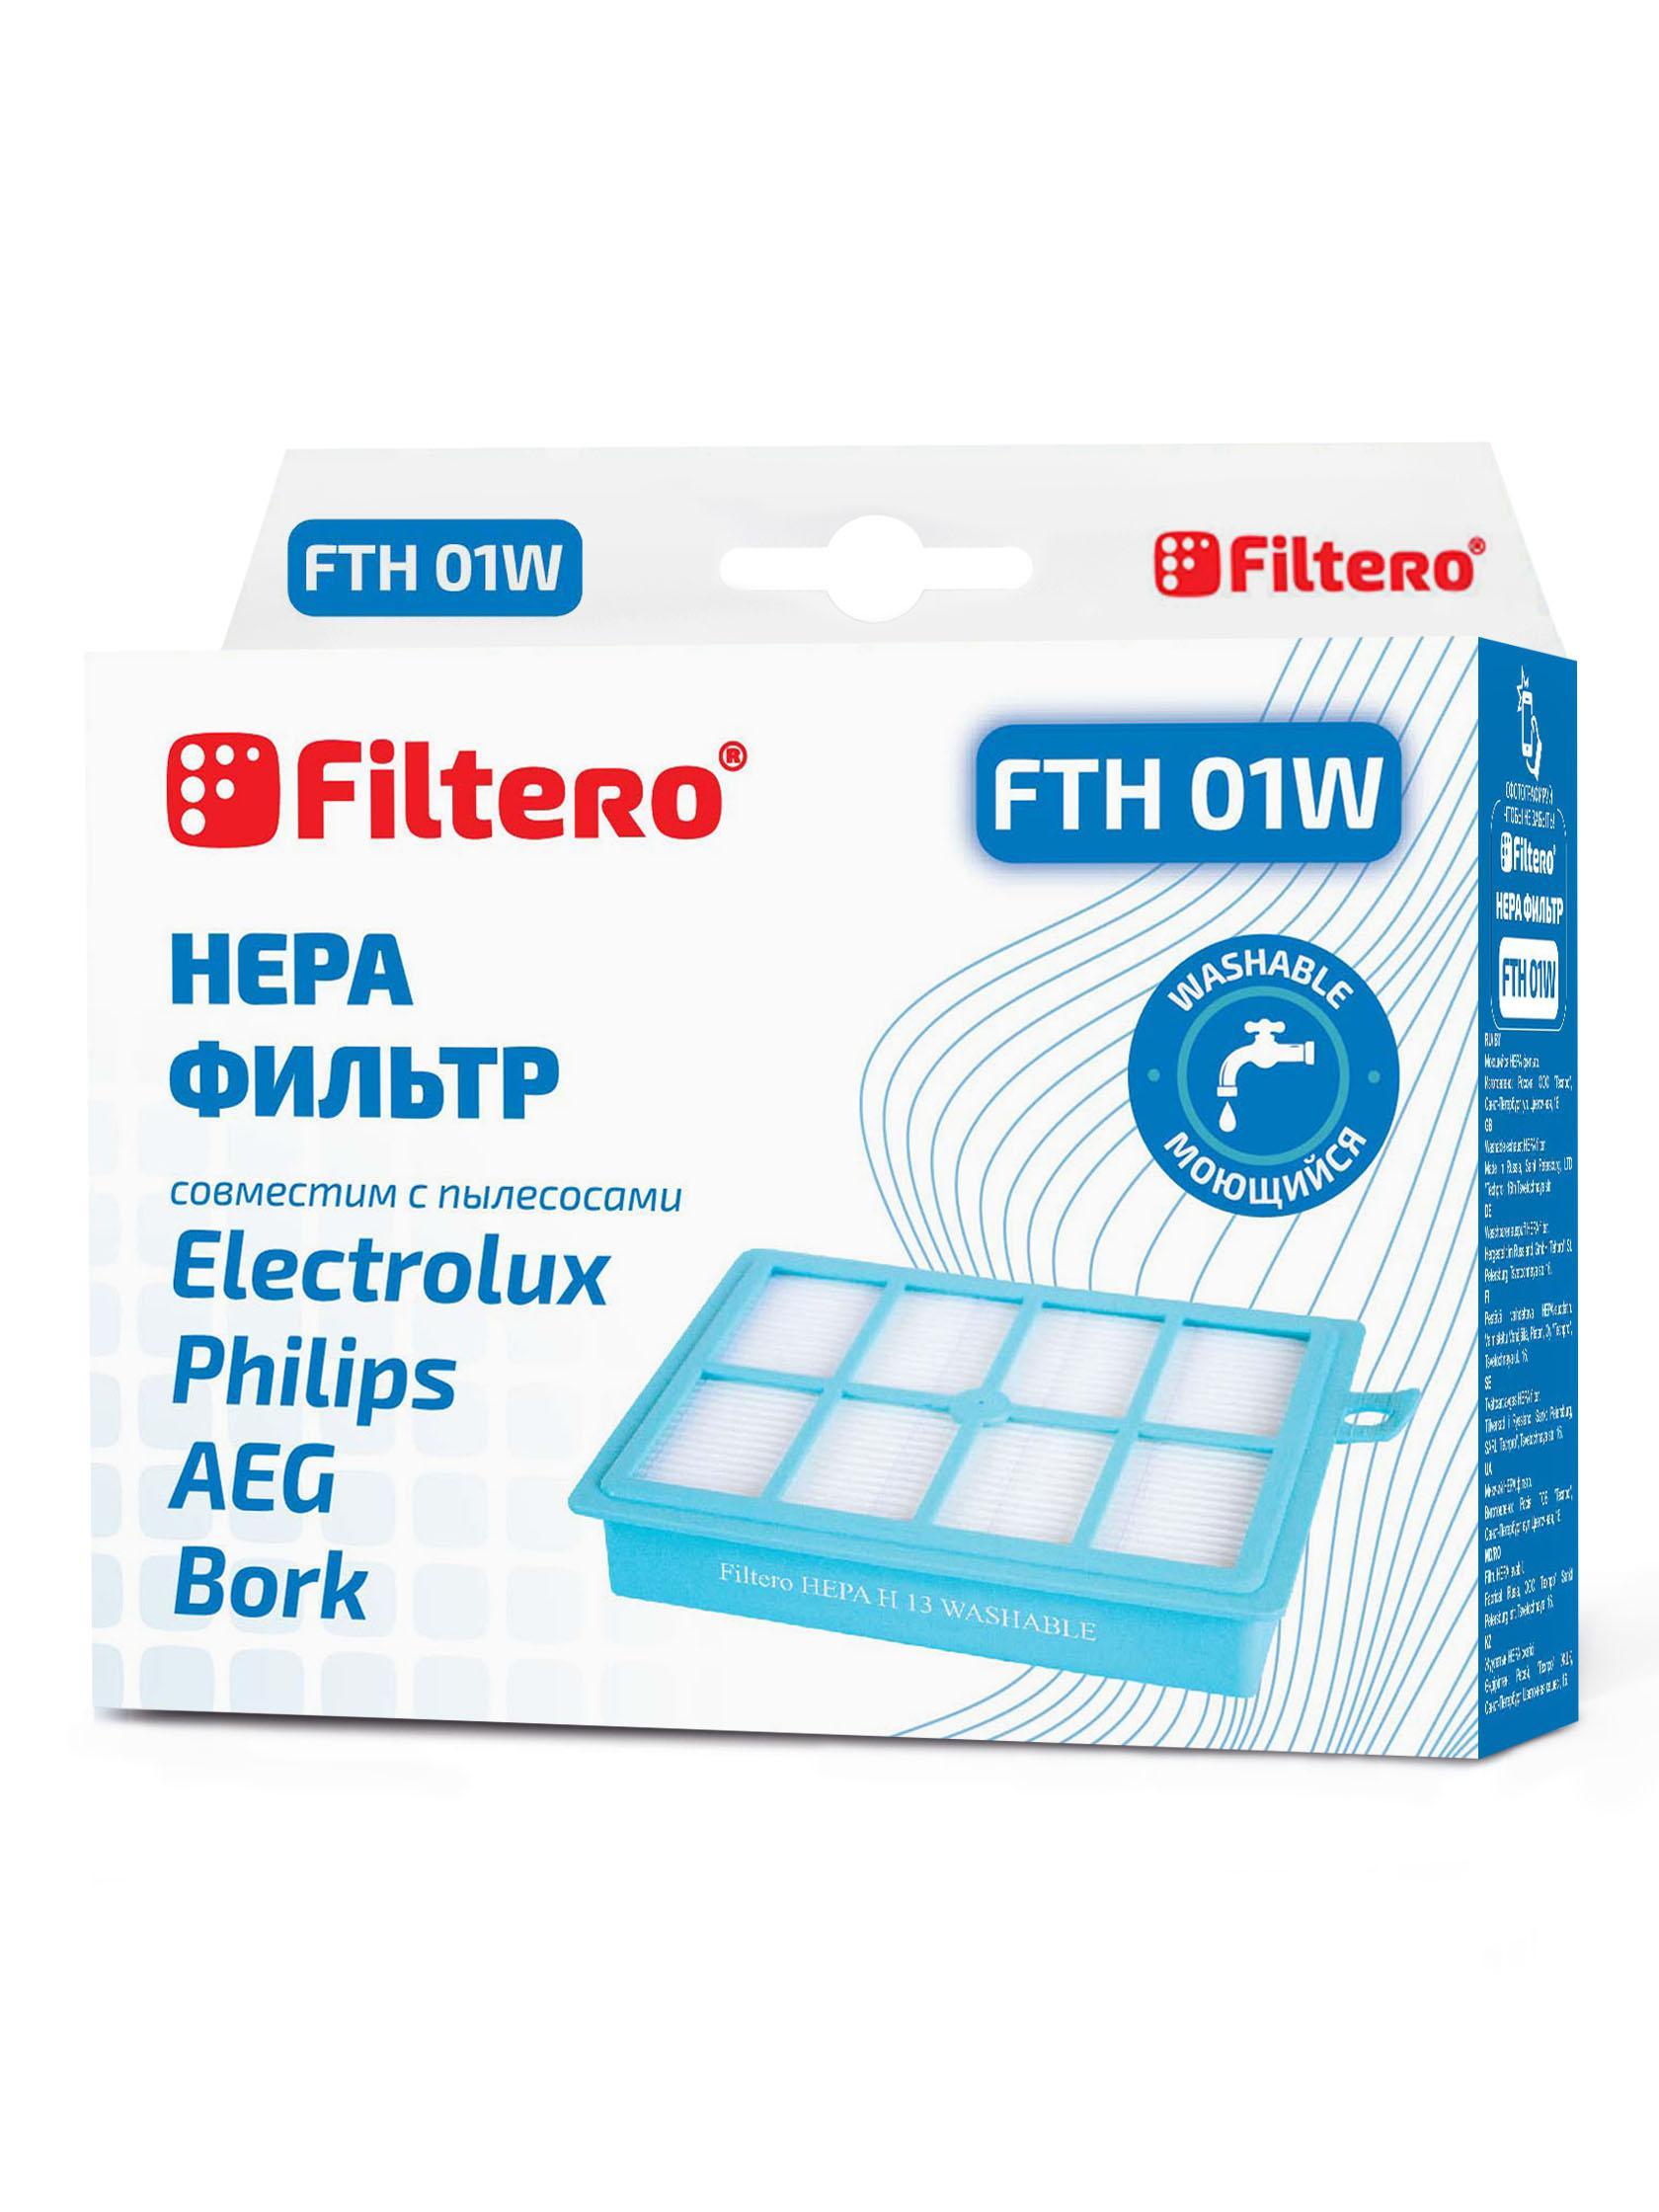 Фильтр Filtero Fth 01 w elx нера фильтр filtero fth 01 w elx 1 шт для пылесосов aeg arnica bork electrolux philips